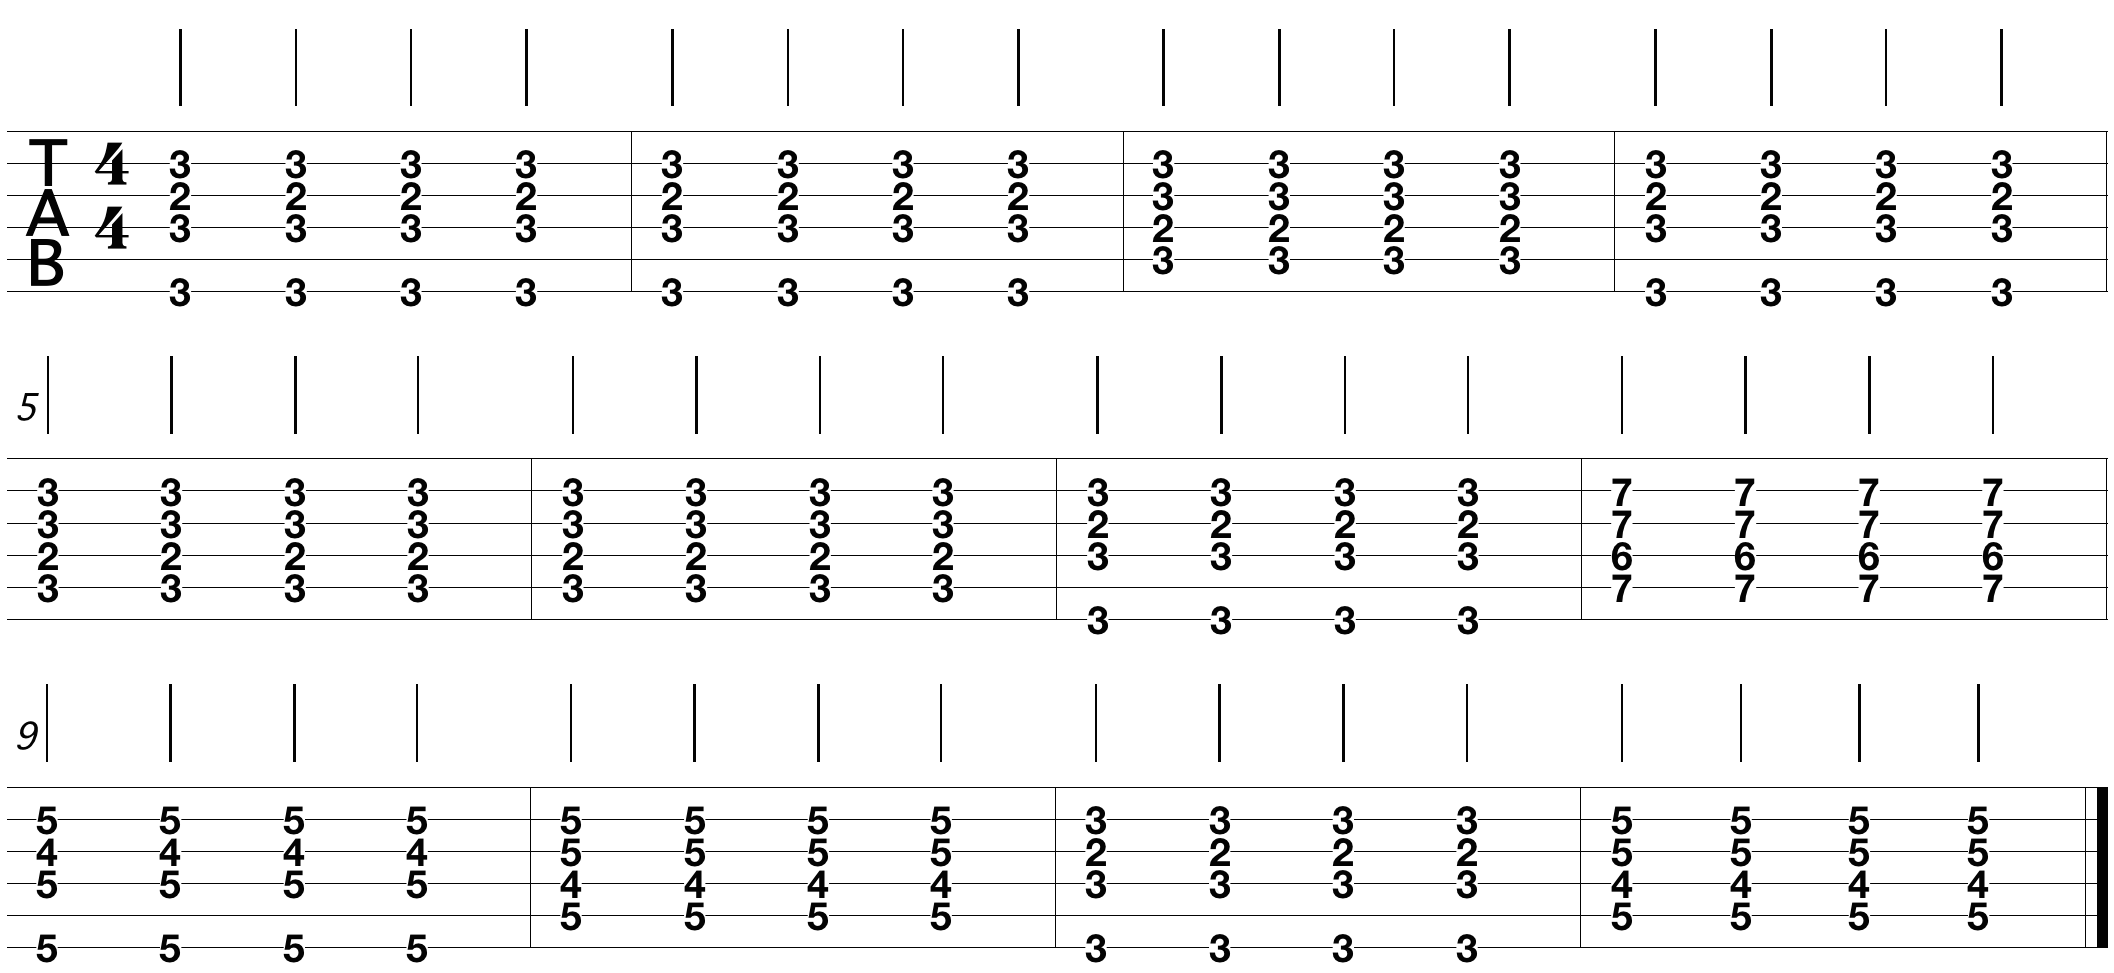 12-bar-blues-guitar-tab_3.png